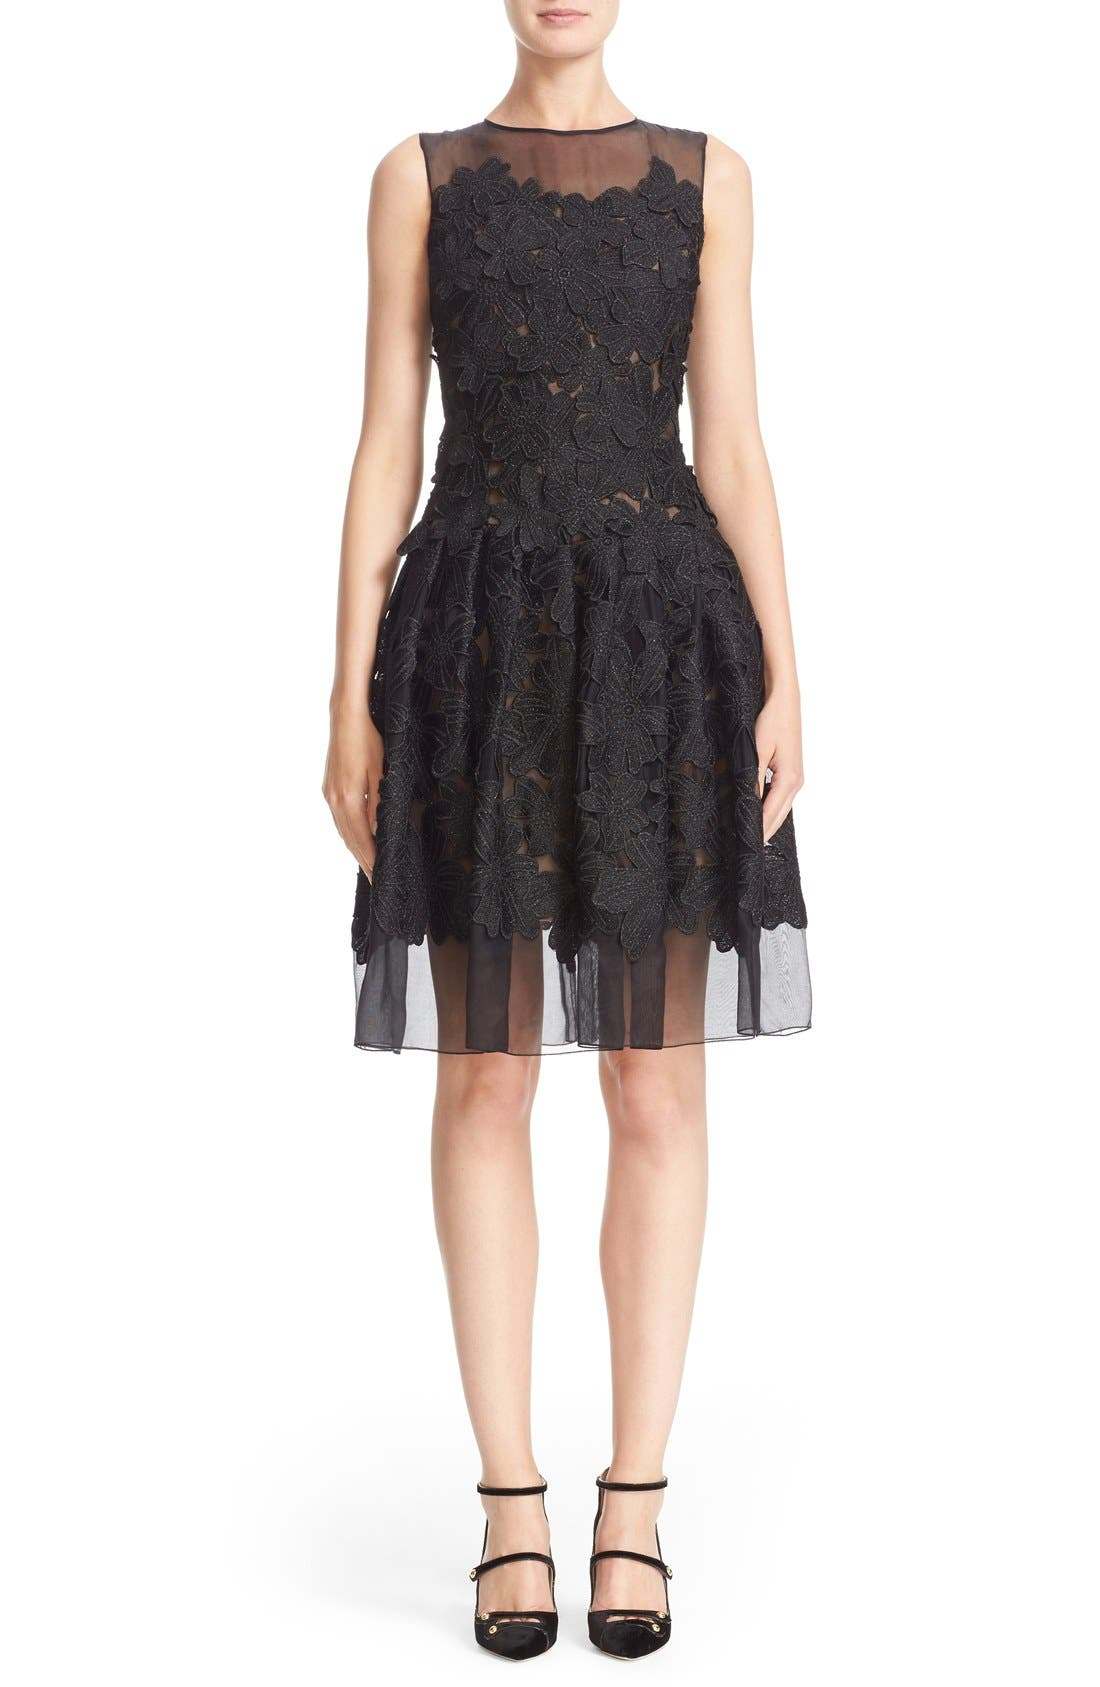 Alternate Image 1 Selected - Carmen Marc Valvo Couture Floral Appliqué Sleeveless Organza Dress